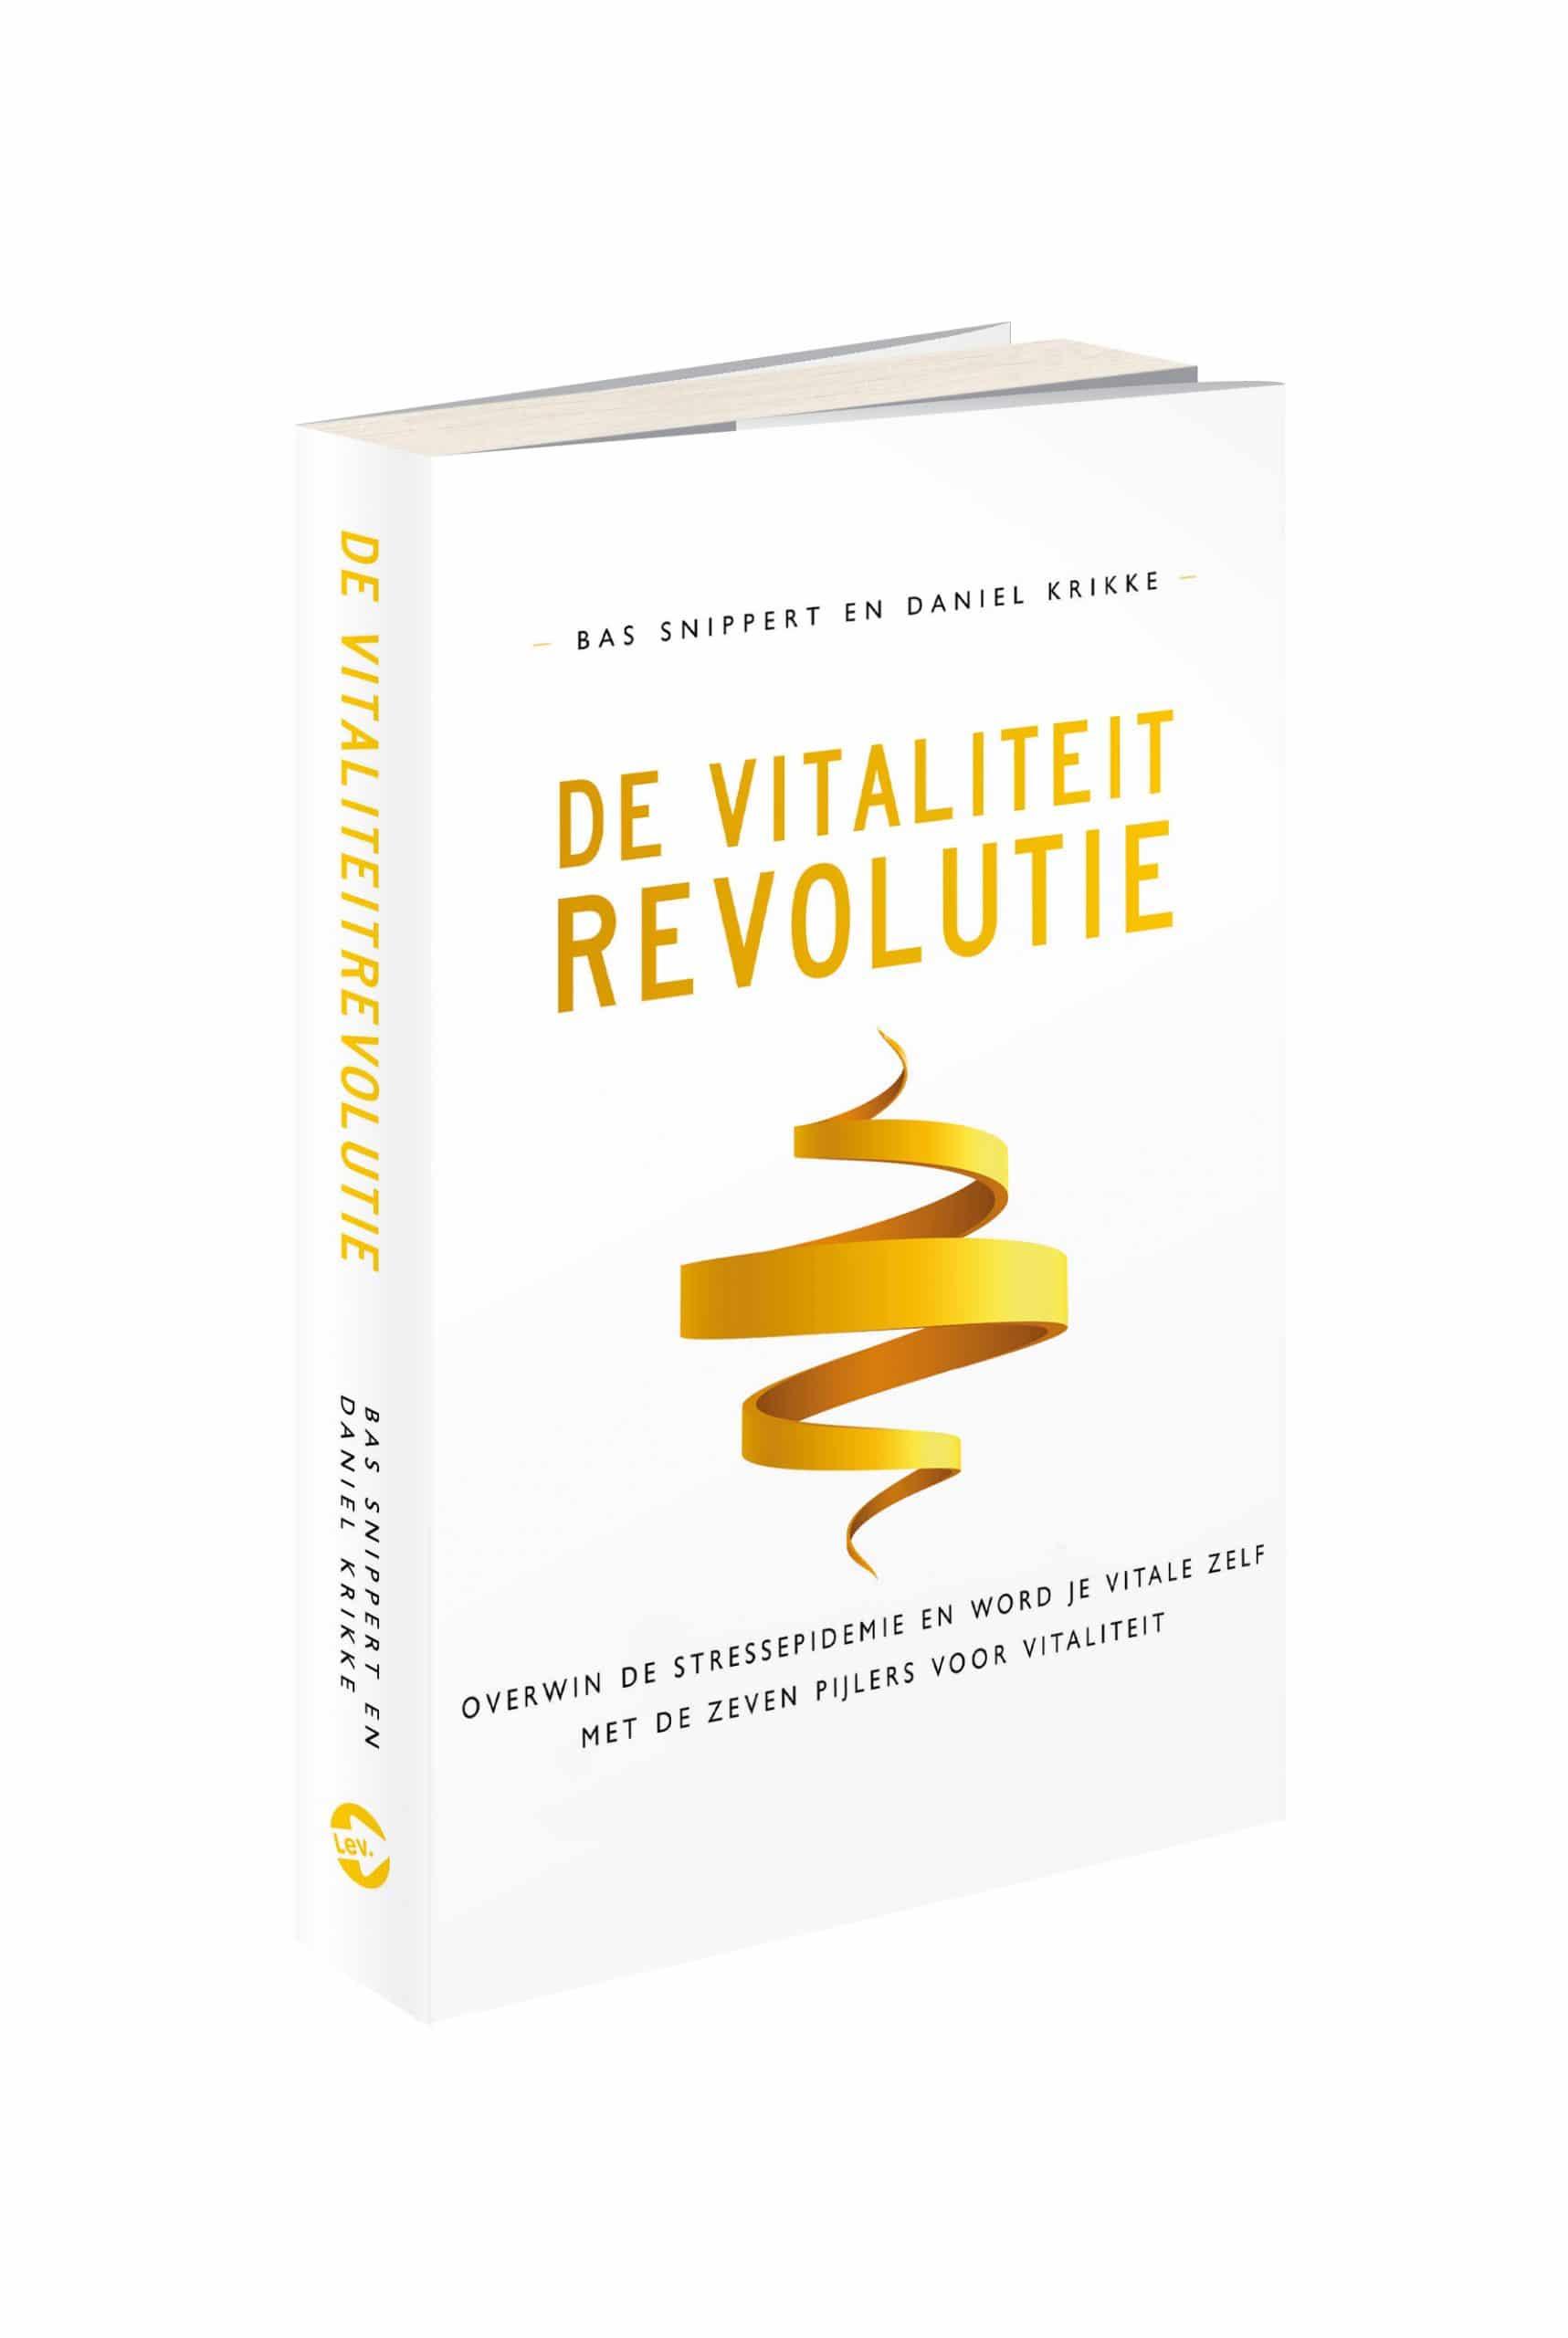 DeVitaliteitrevolutieCover Scaled 1